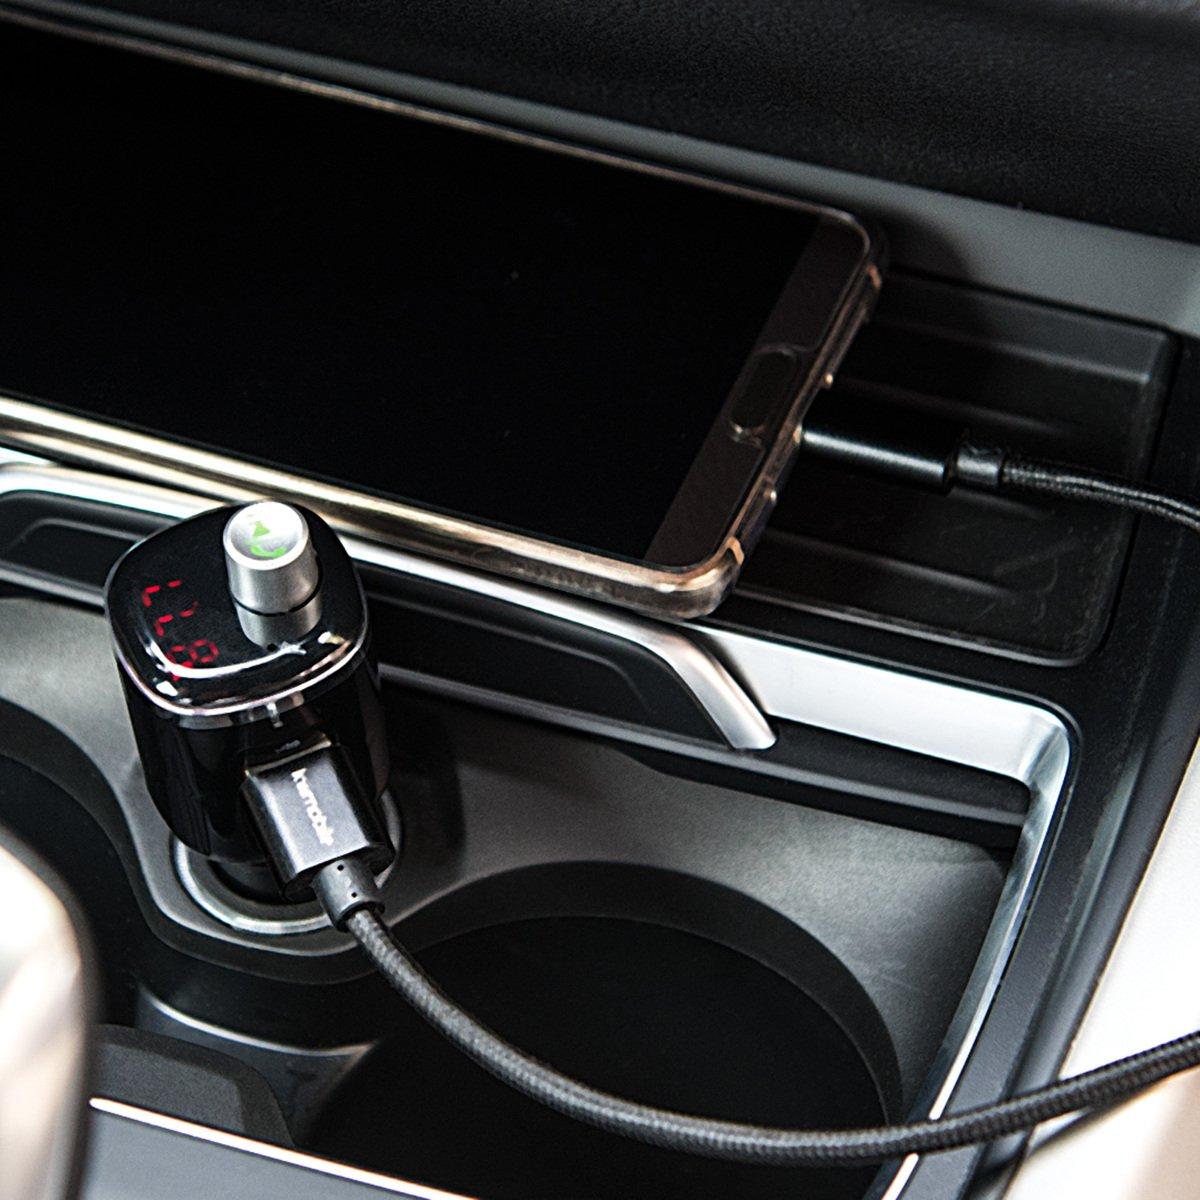 Indicador LED y micr/ófono para Manos Libres 2 Puertos de Carga USB para Smartphones kwmobile Transmisor de FM Bluetooth para Coche Radio